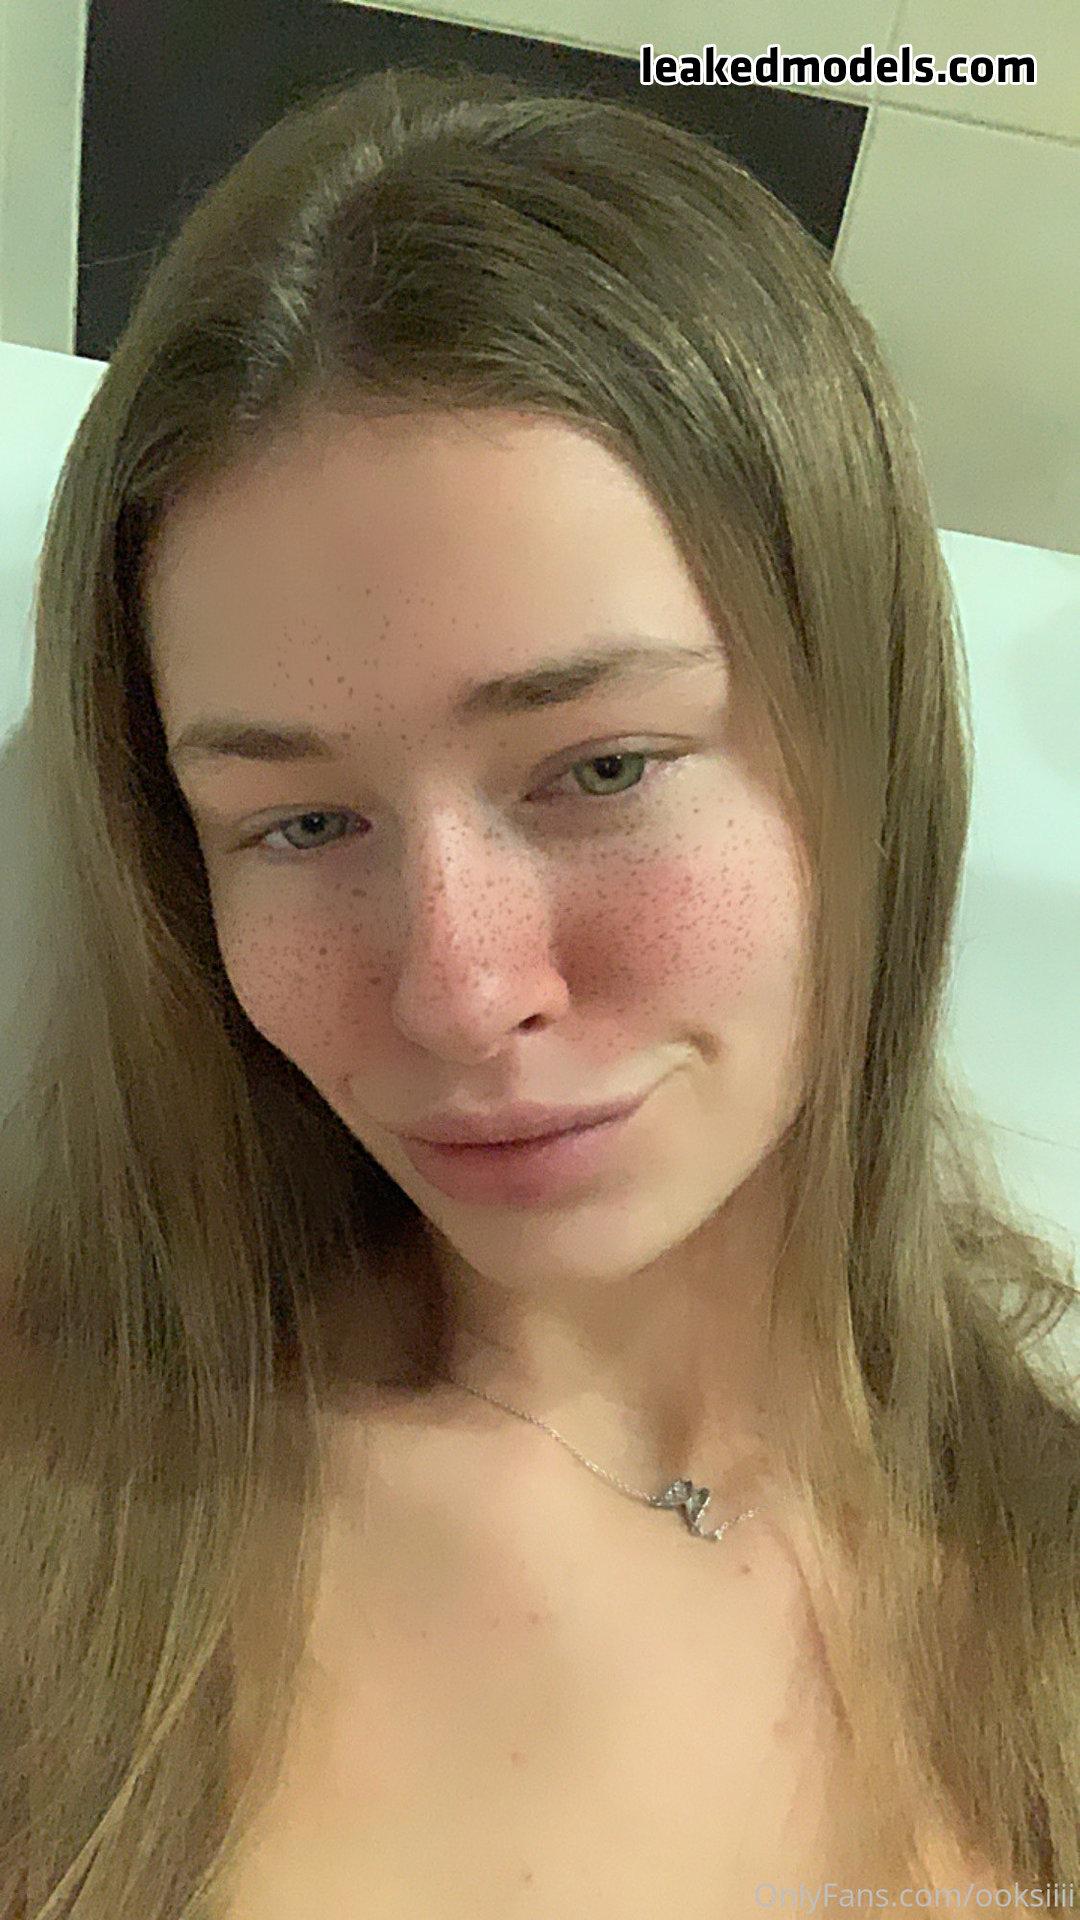 Oksana Fedorova – ooksiiii Onlyfans Leaks (44 photos + 5 videos)